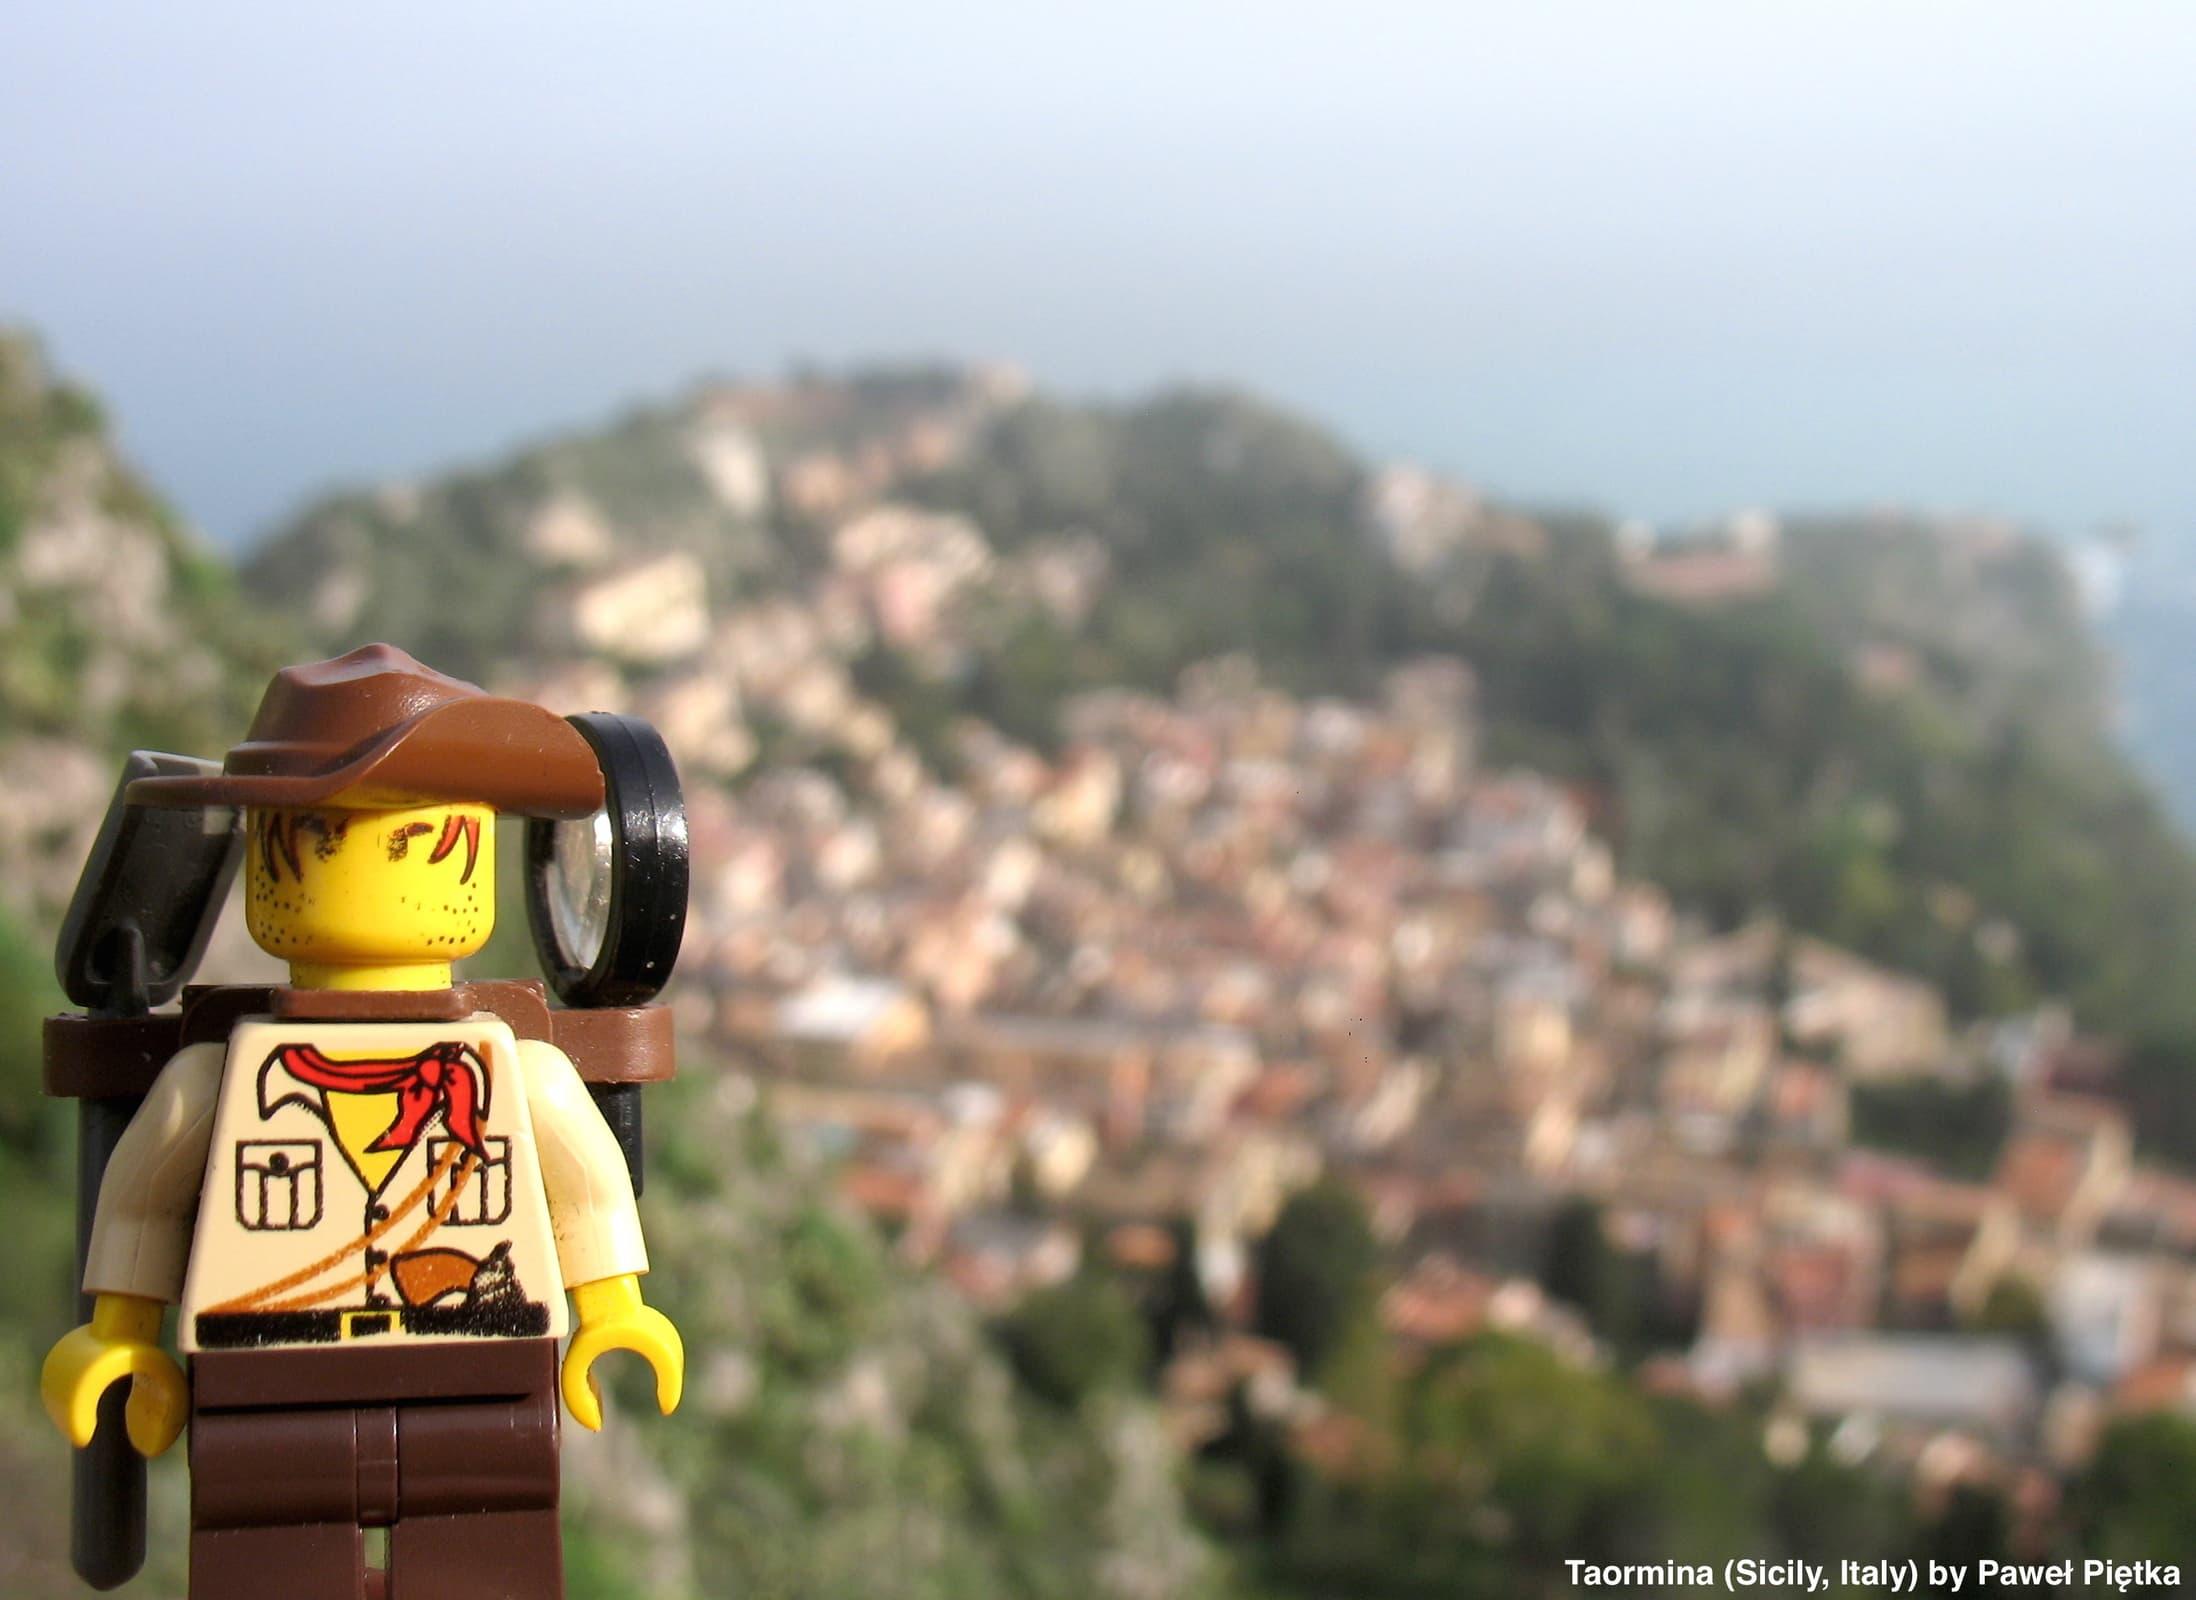 Taormina (Sicily, Italy) - View from the Saracen castle